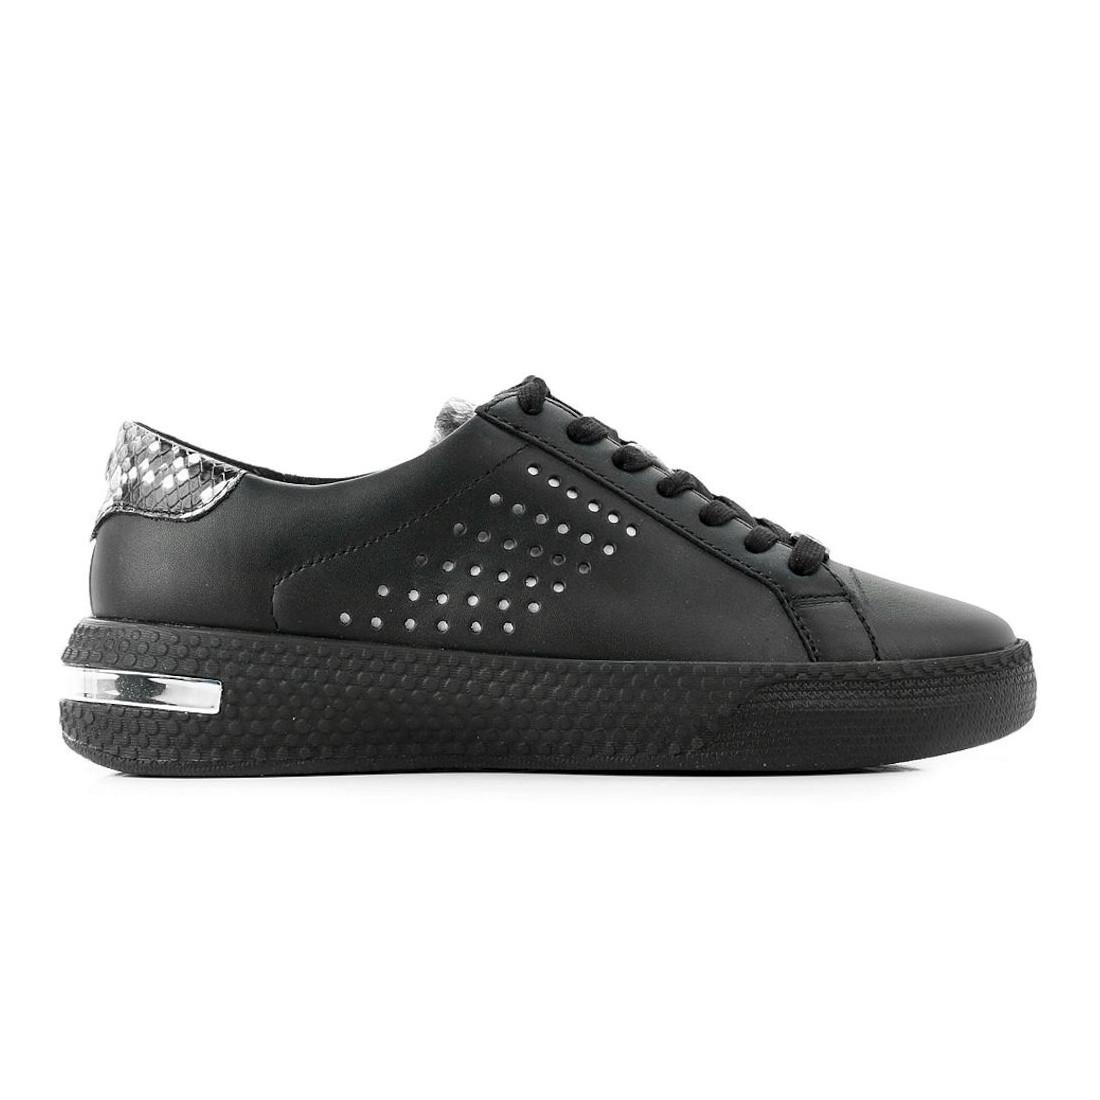 sneakers woman michael kors 43t0cefs3l001 7583